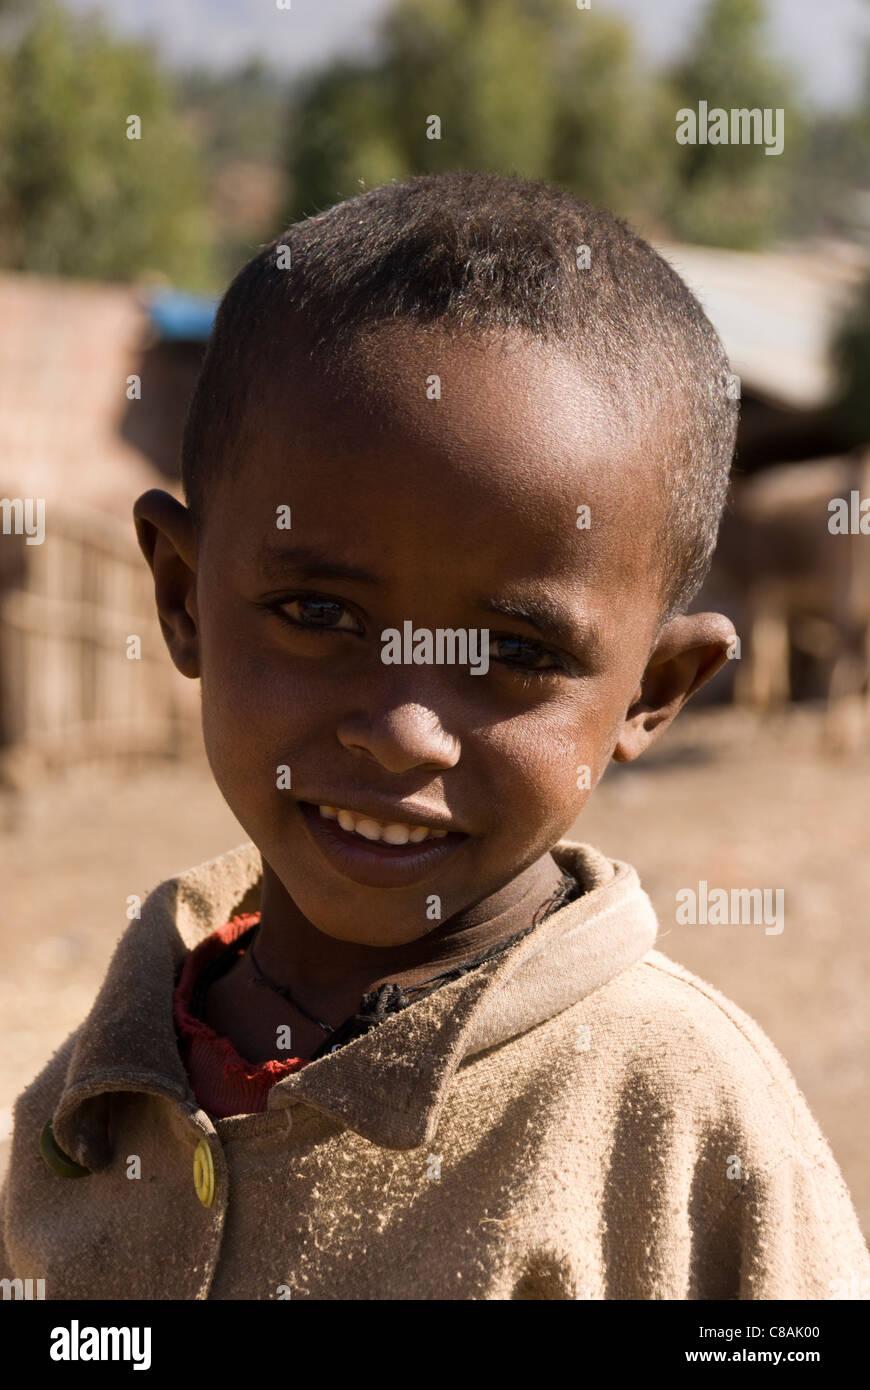 Elk200-3035v Ethiopia, Lalibela, portrait of Ethiopian boy - Stock Image